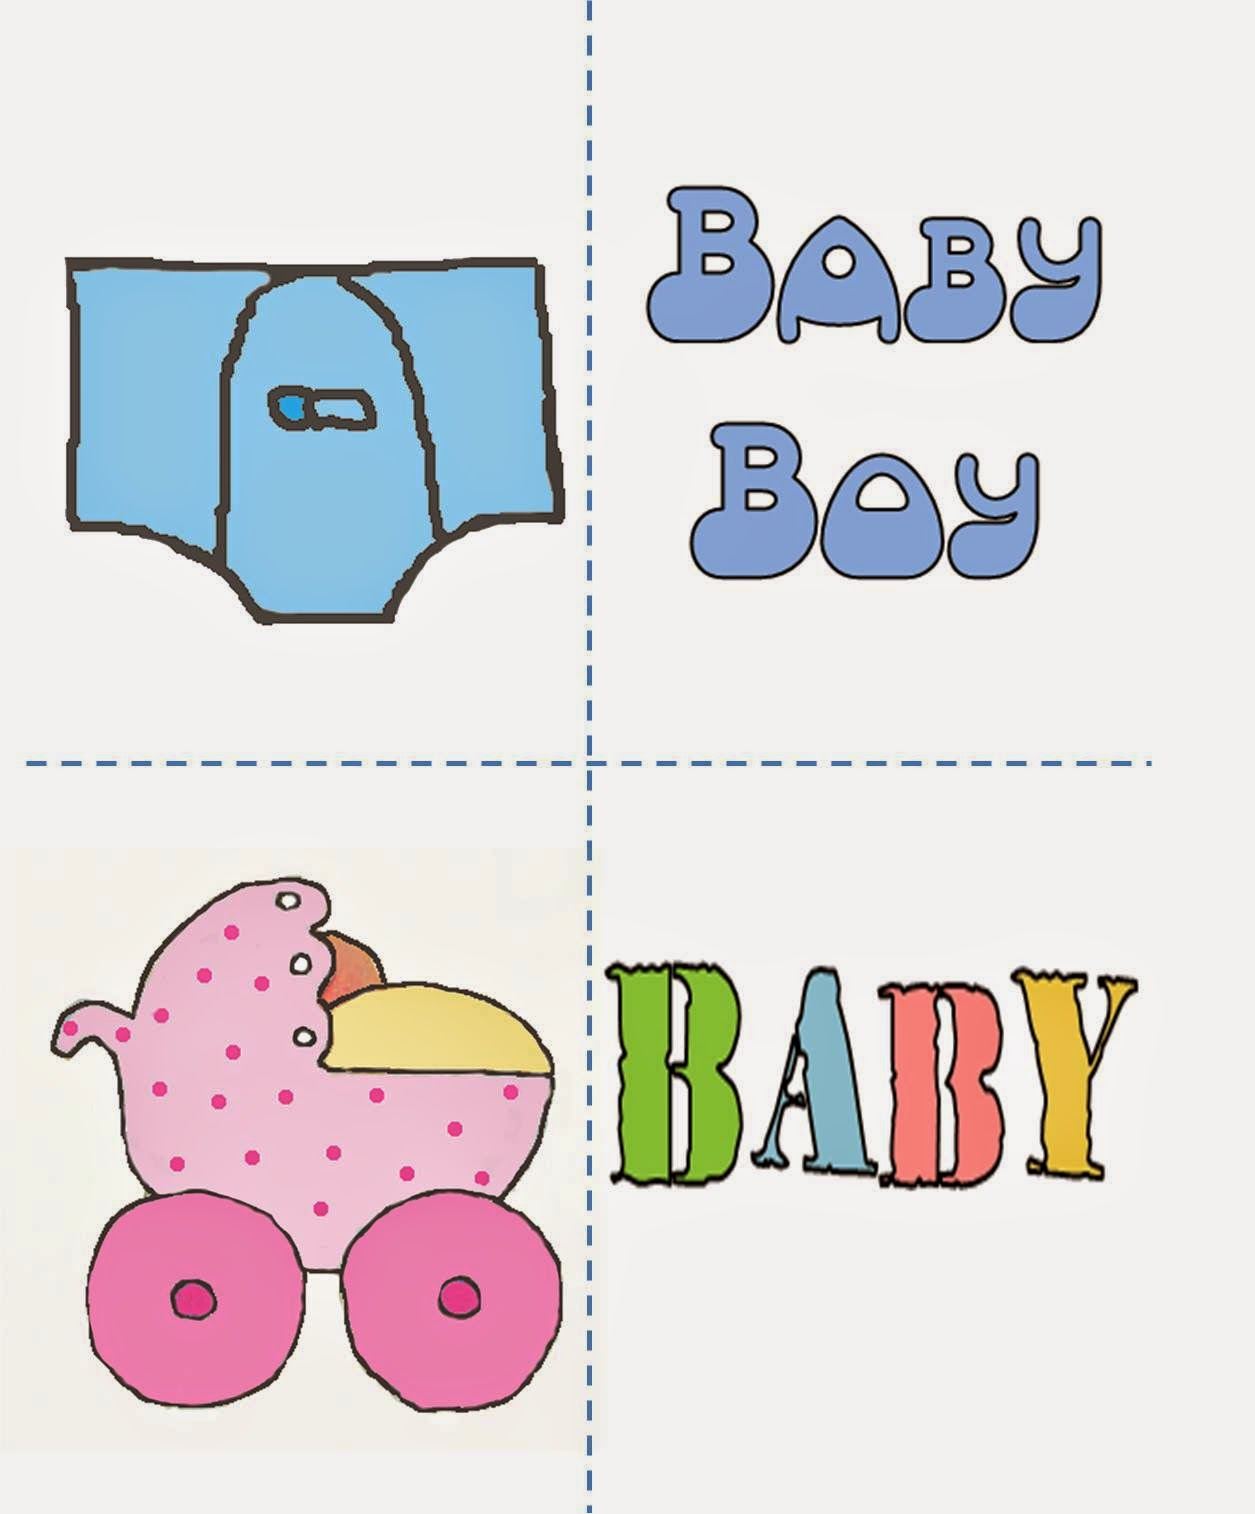 GRATIS BABY